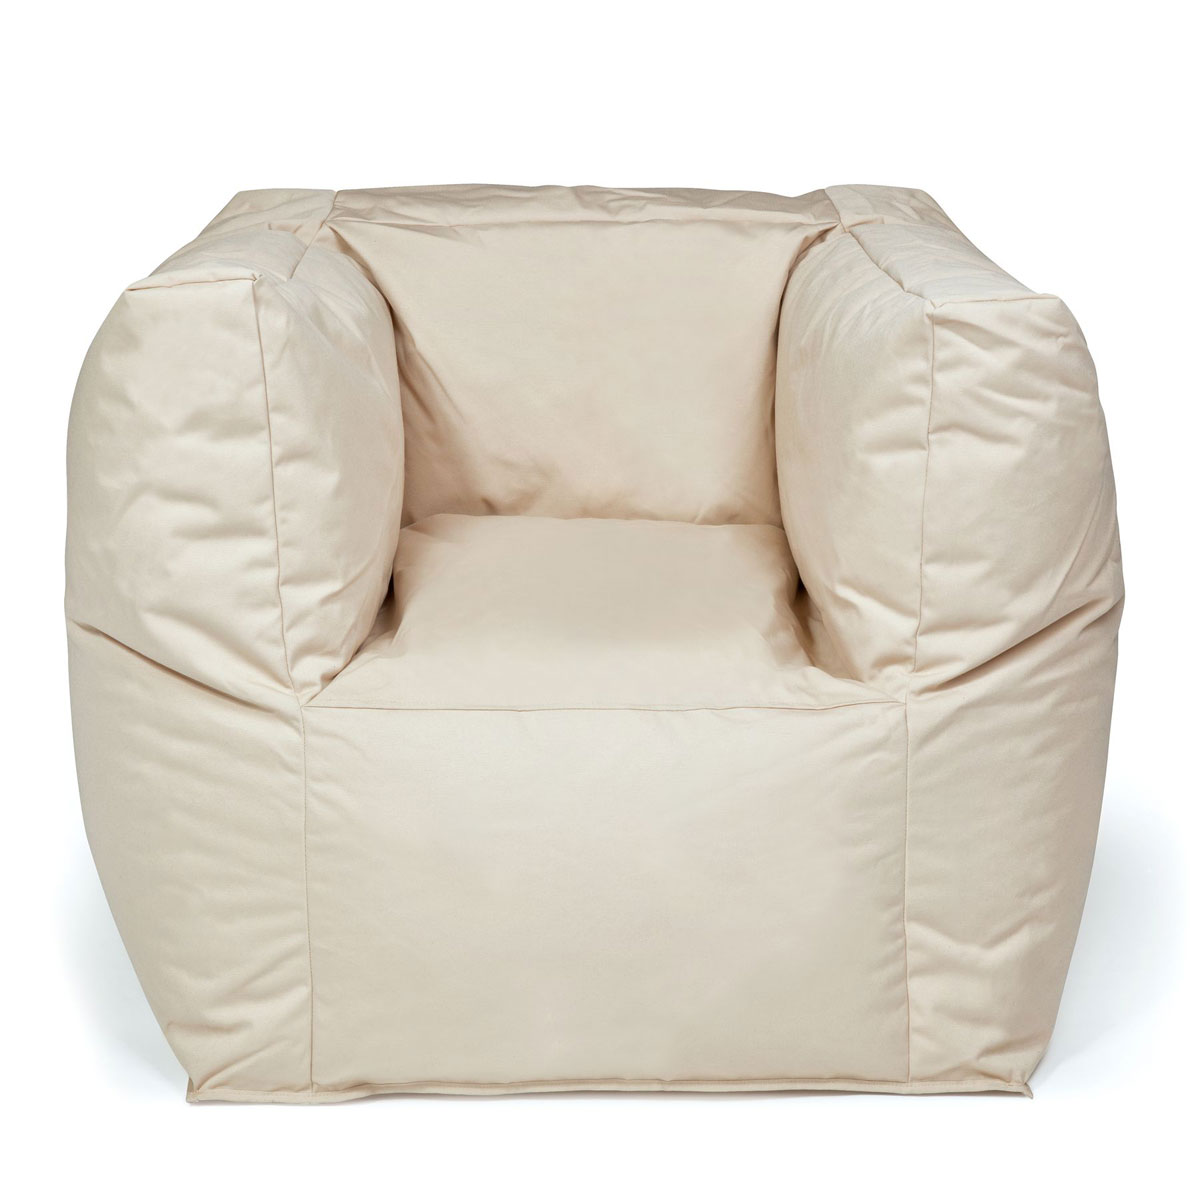 OUTBAG Valley Outdoor-Sessel Sitzsack plus beige